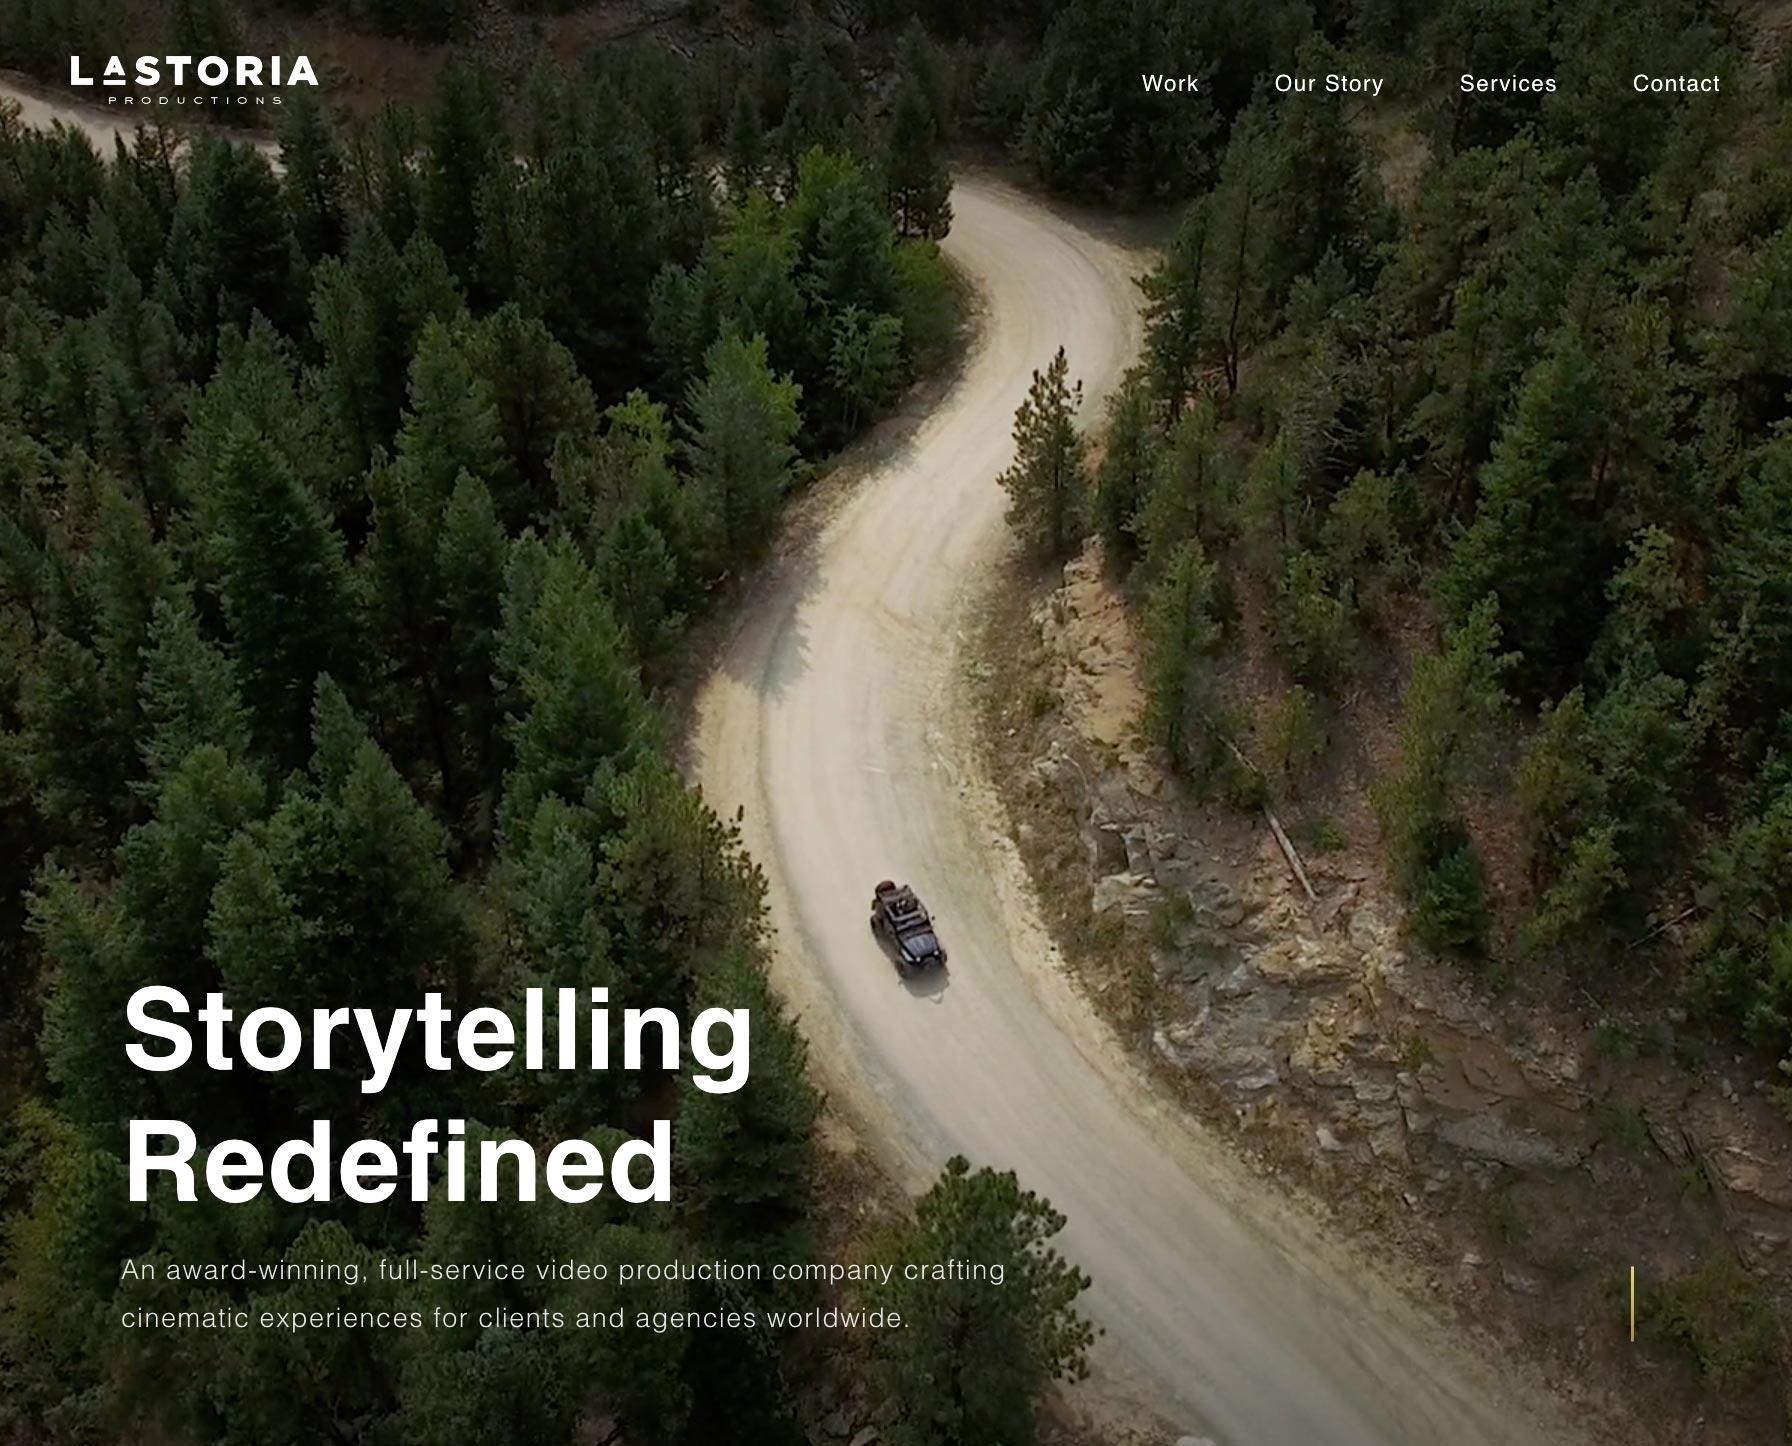 Screenshot of Lastoria Productions Website Homepage from https://lastoriaproductions.com/